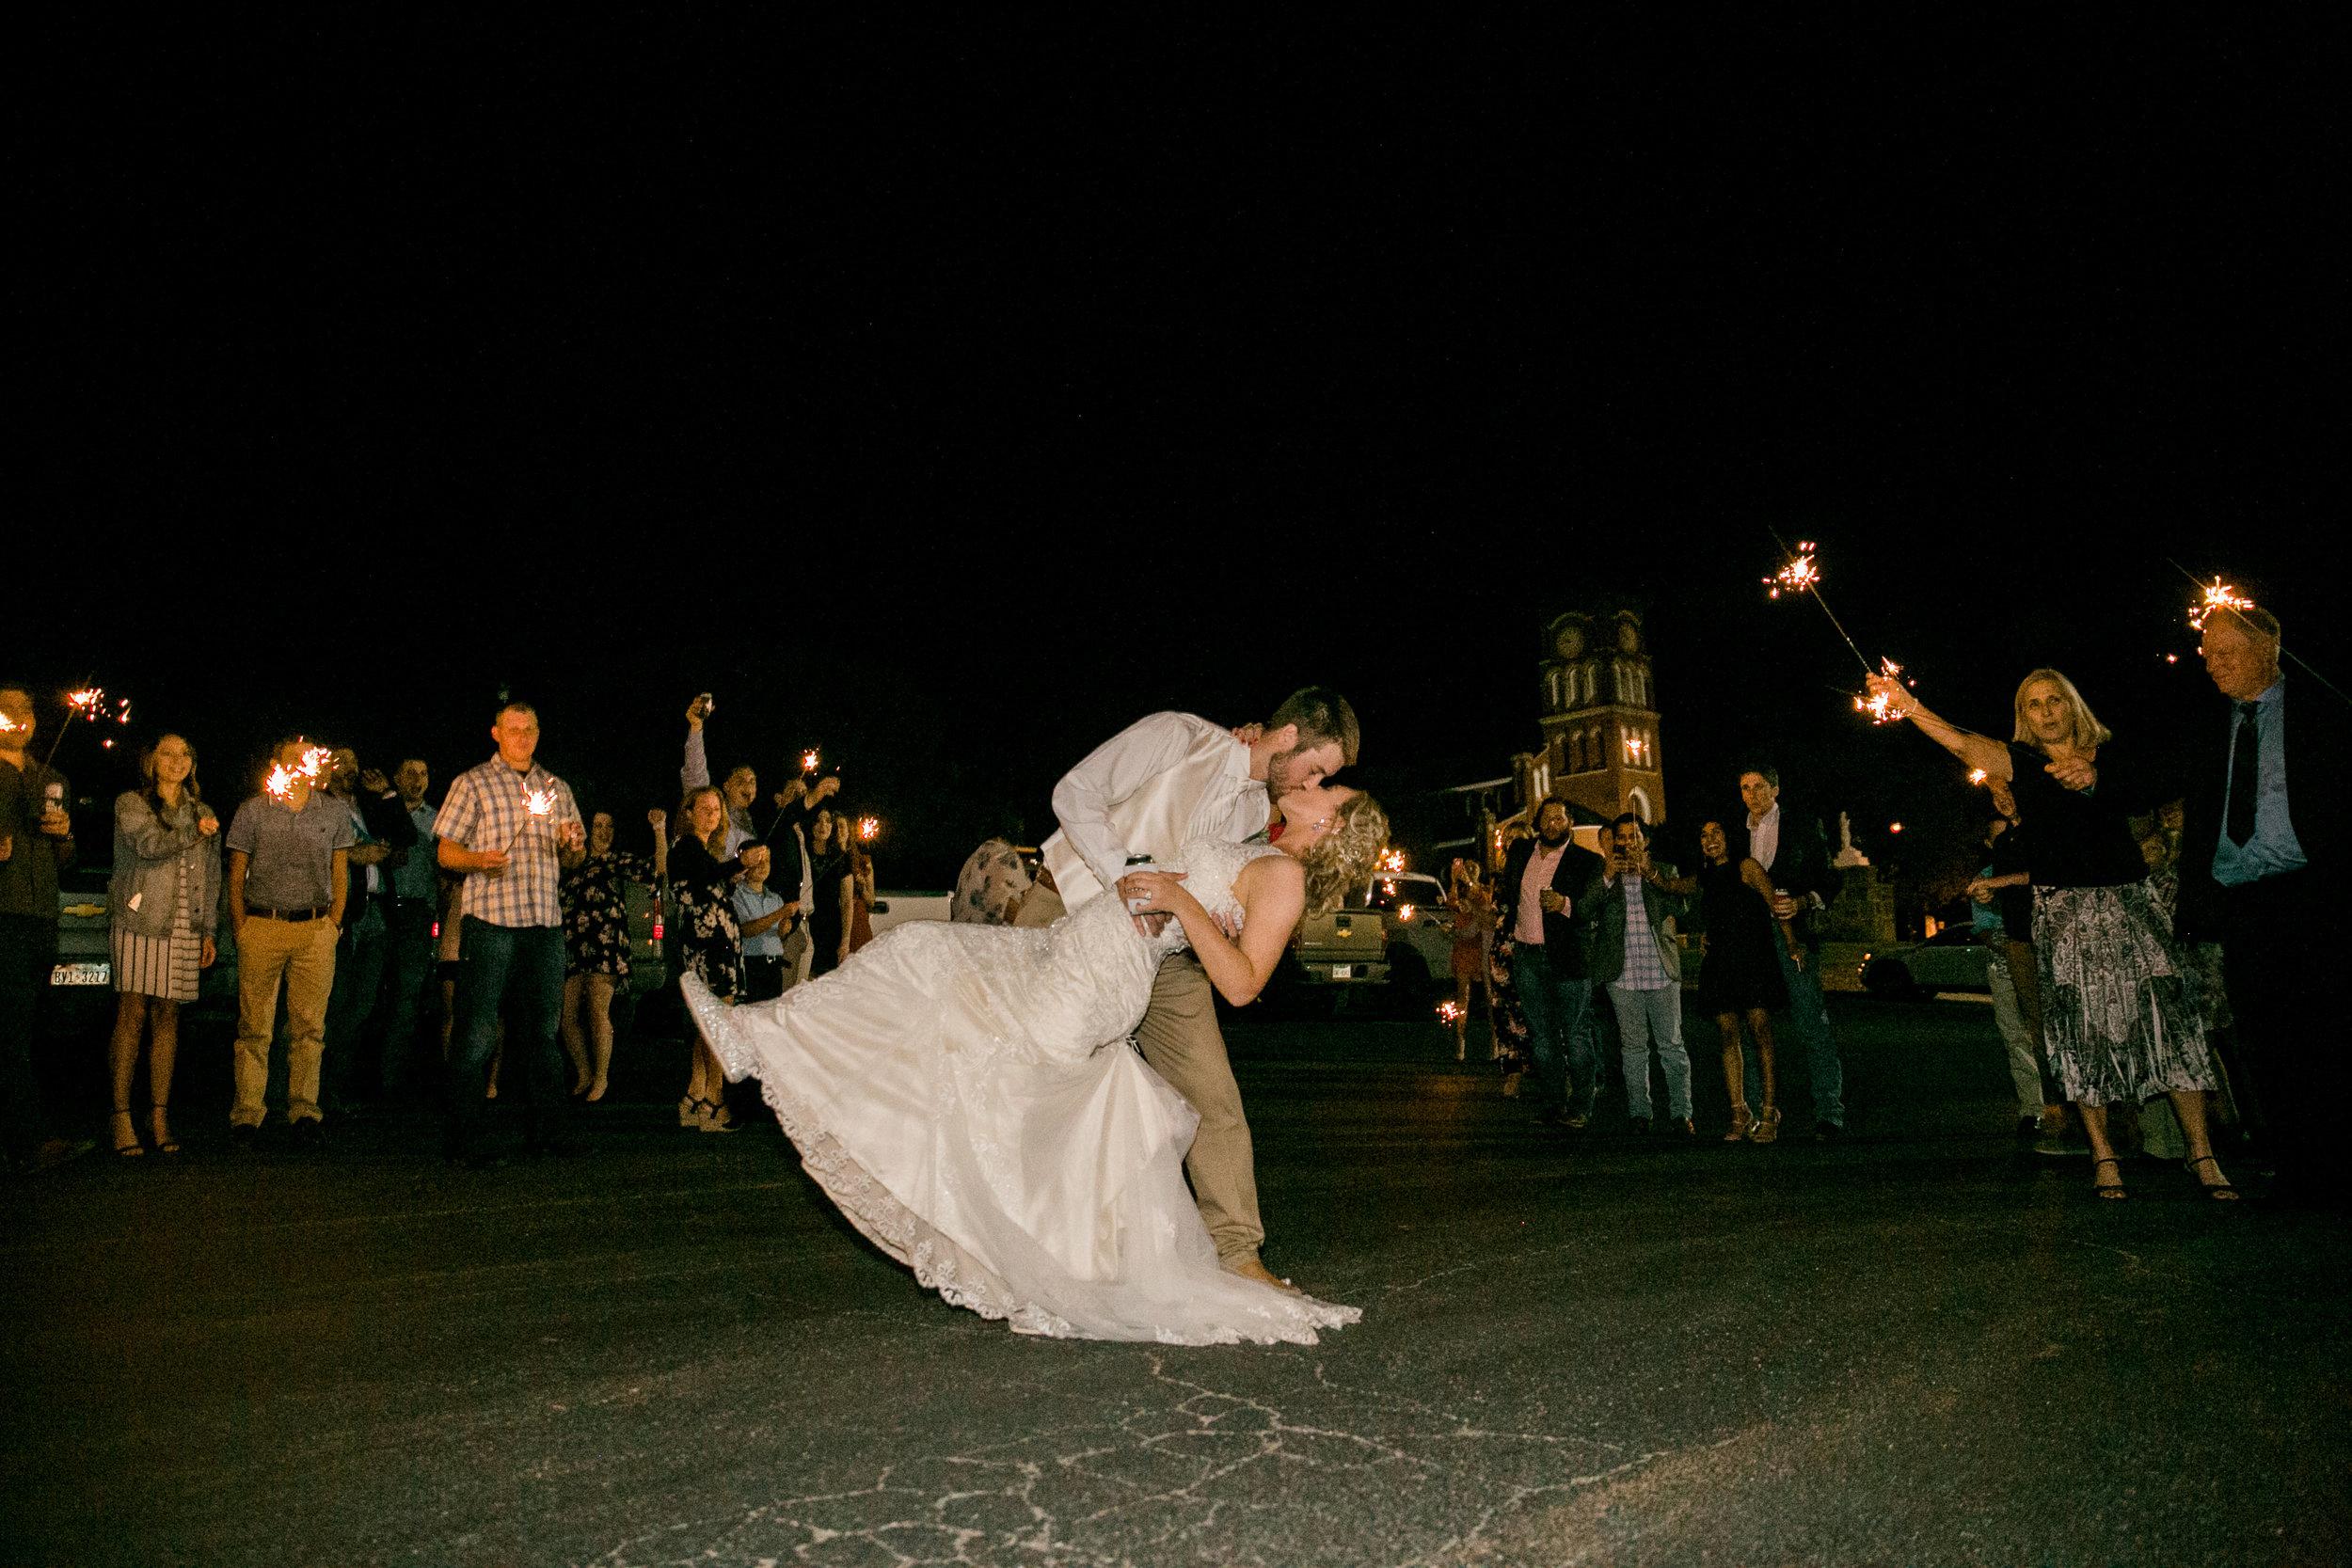 Bailey-Nathan-Windthorst-Texas-Wedding-068.jpg